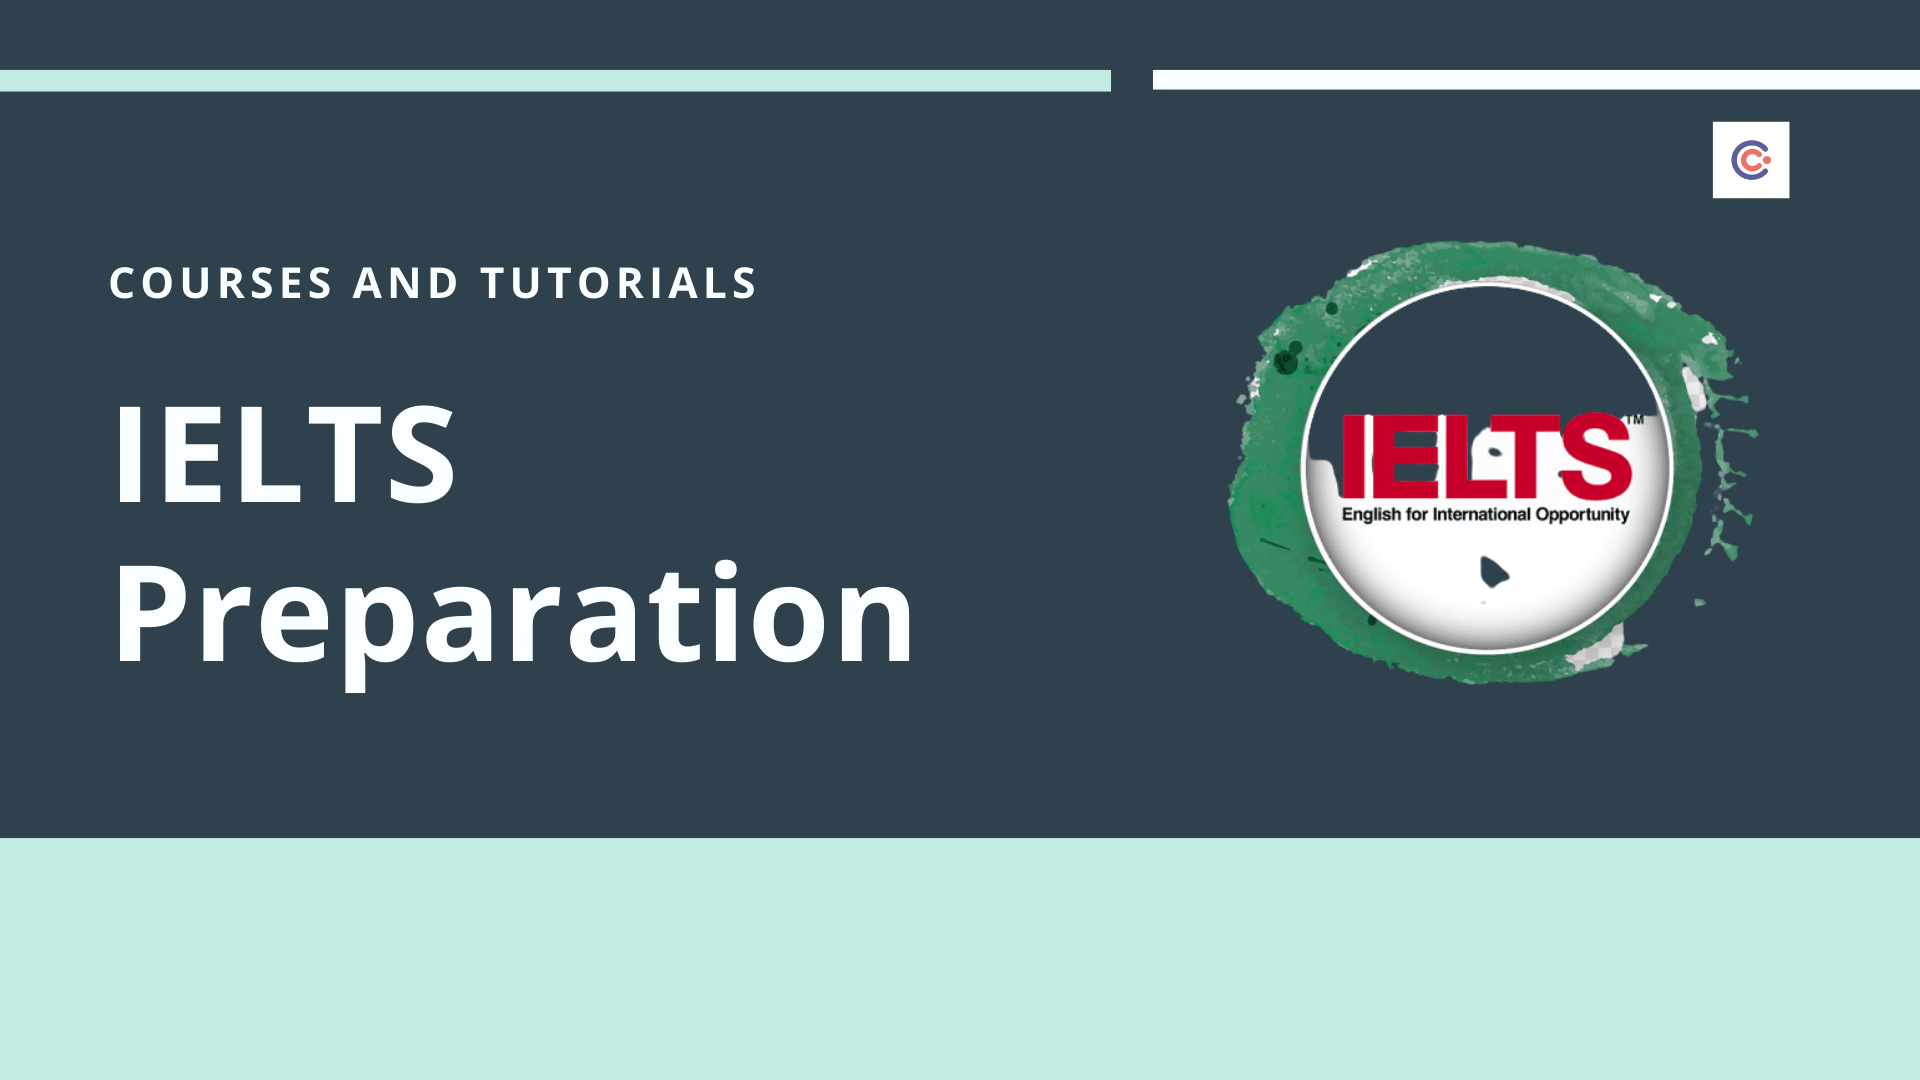 8 Best IELTS Preparation Training and Courses - Learn IELTS Online